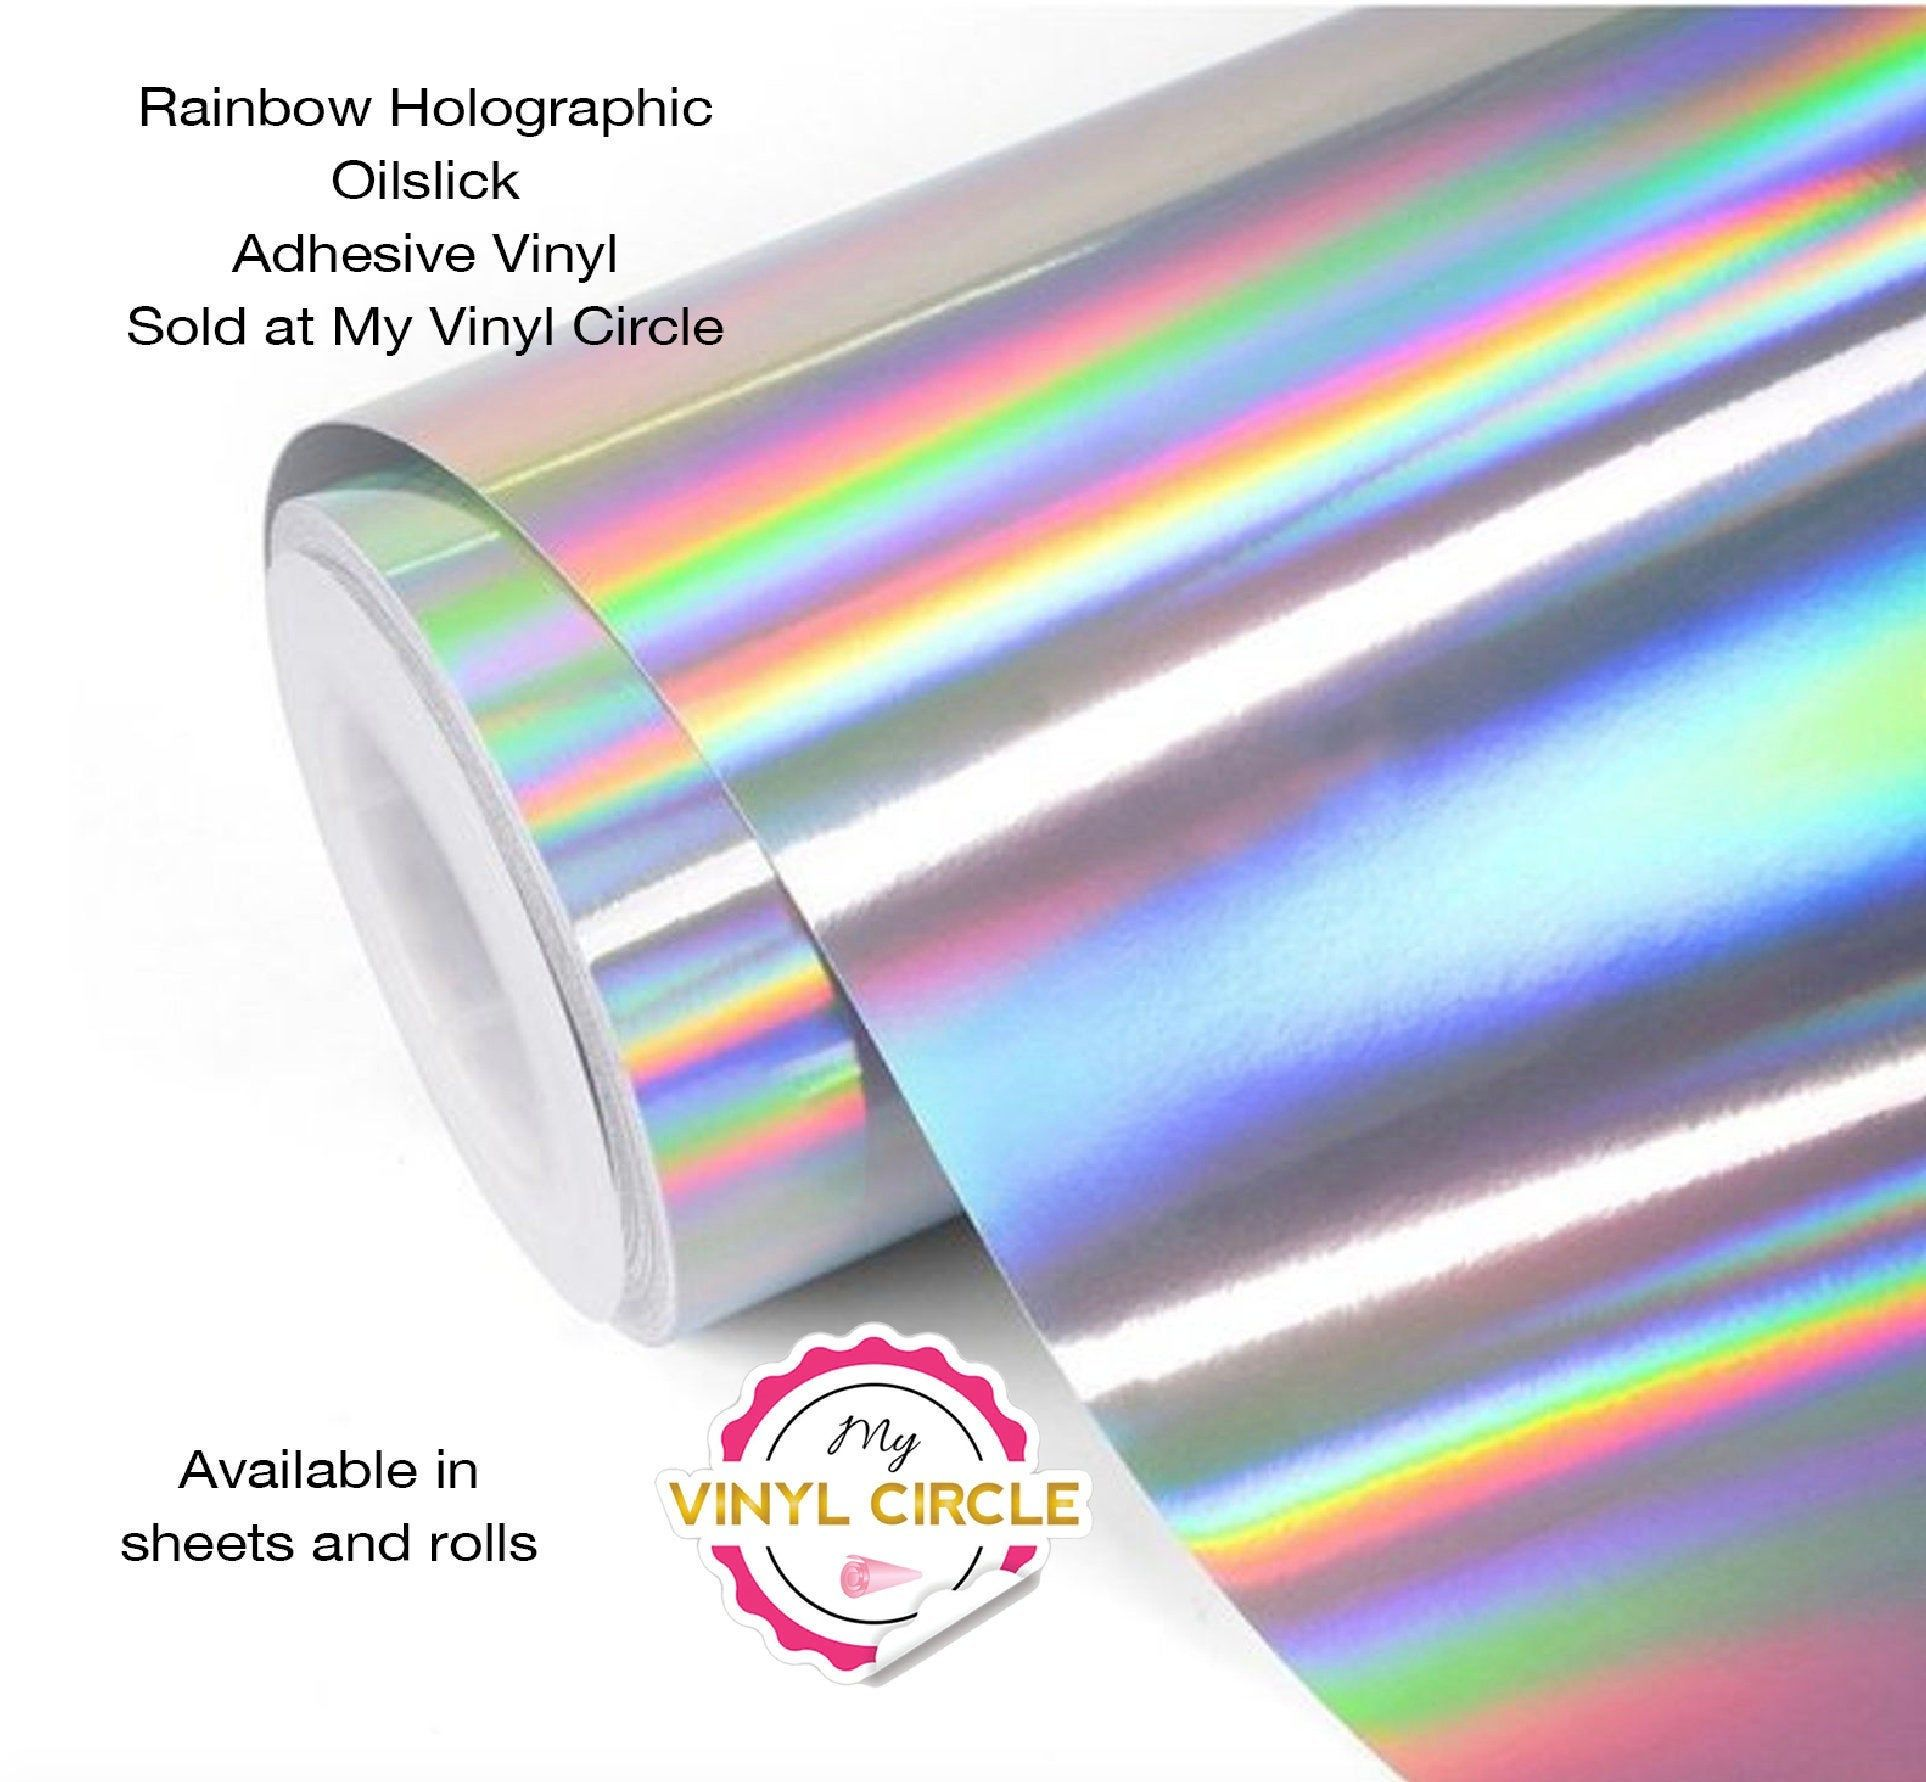 Adhesive Rainbow Chrome Vinyl Silver Oil Slick Vinyl, Rainbow Chrome Holographic Vinyl Sheets or Roll, Permanent Vinyl Decal Vinyl #651 #cricut #cameo #UnicornHtv #Permanent #oilslick #OilSlick #silhouette #UnicornVinyl #AdhesiveVinyl